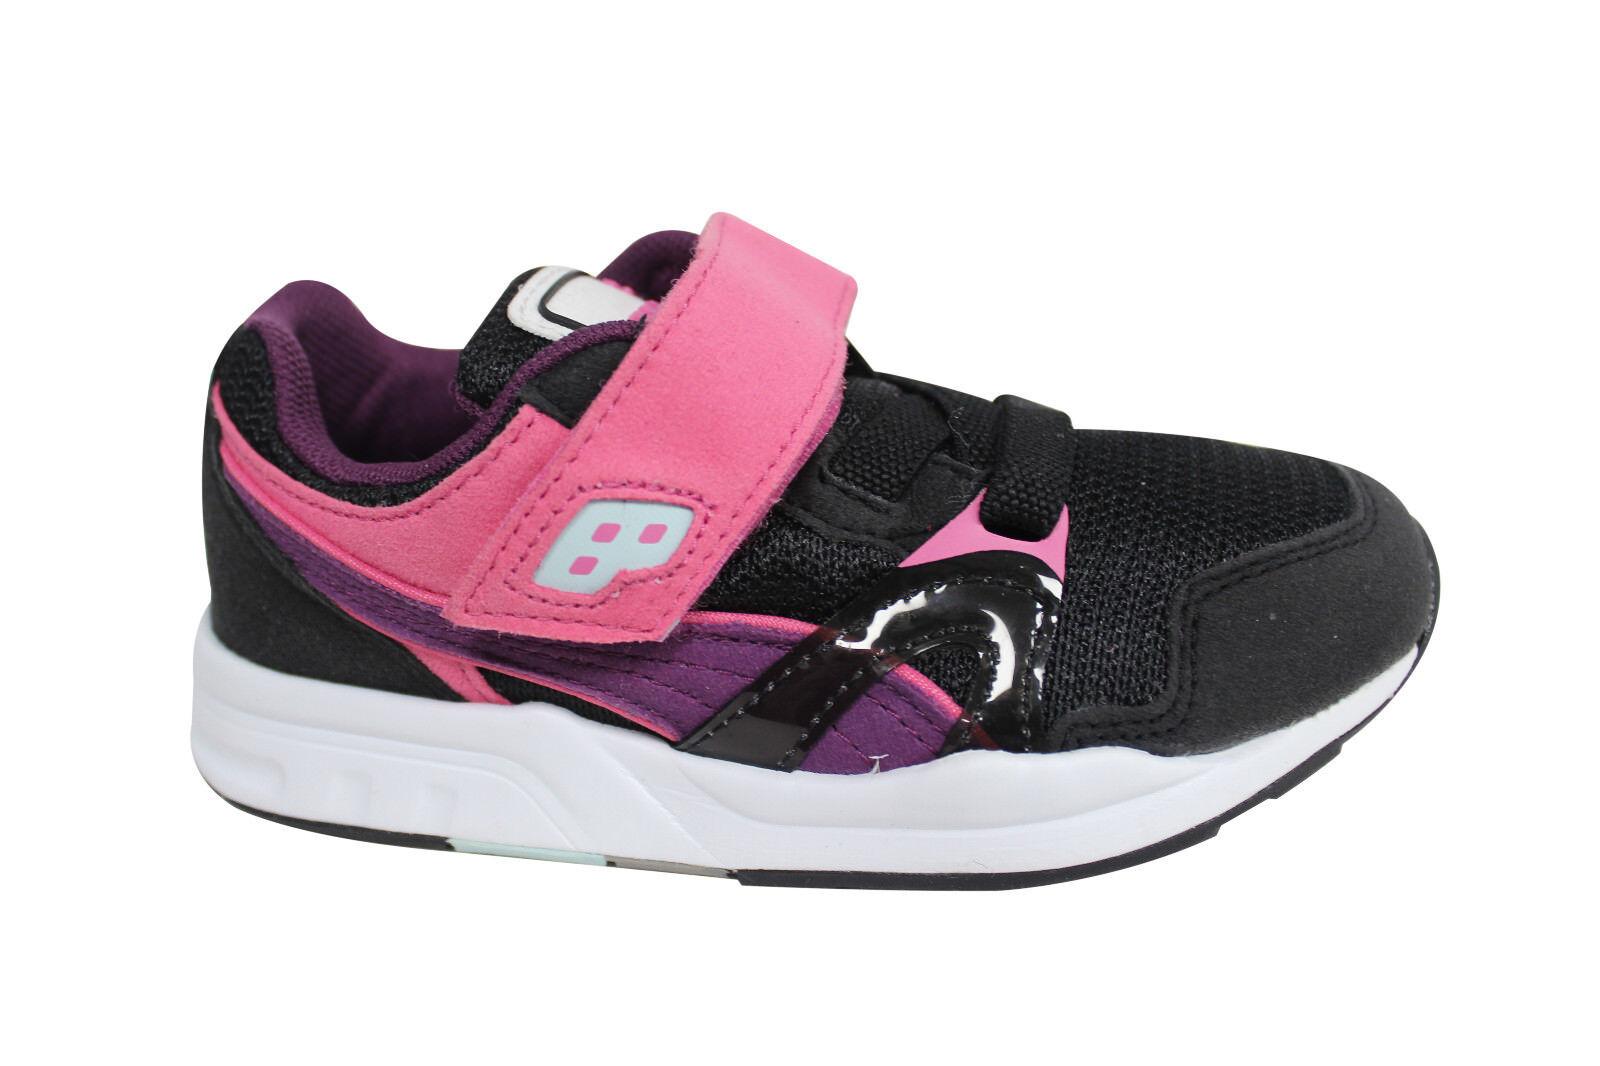 ae30218d8d0b Puma Trinomic XT 1 Plus V Kids Trainers Shoes Black Pink 359454 03 ...